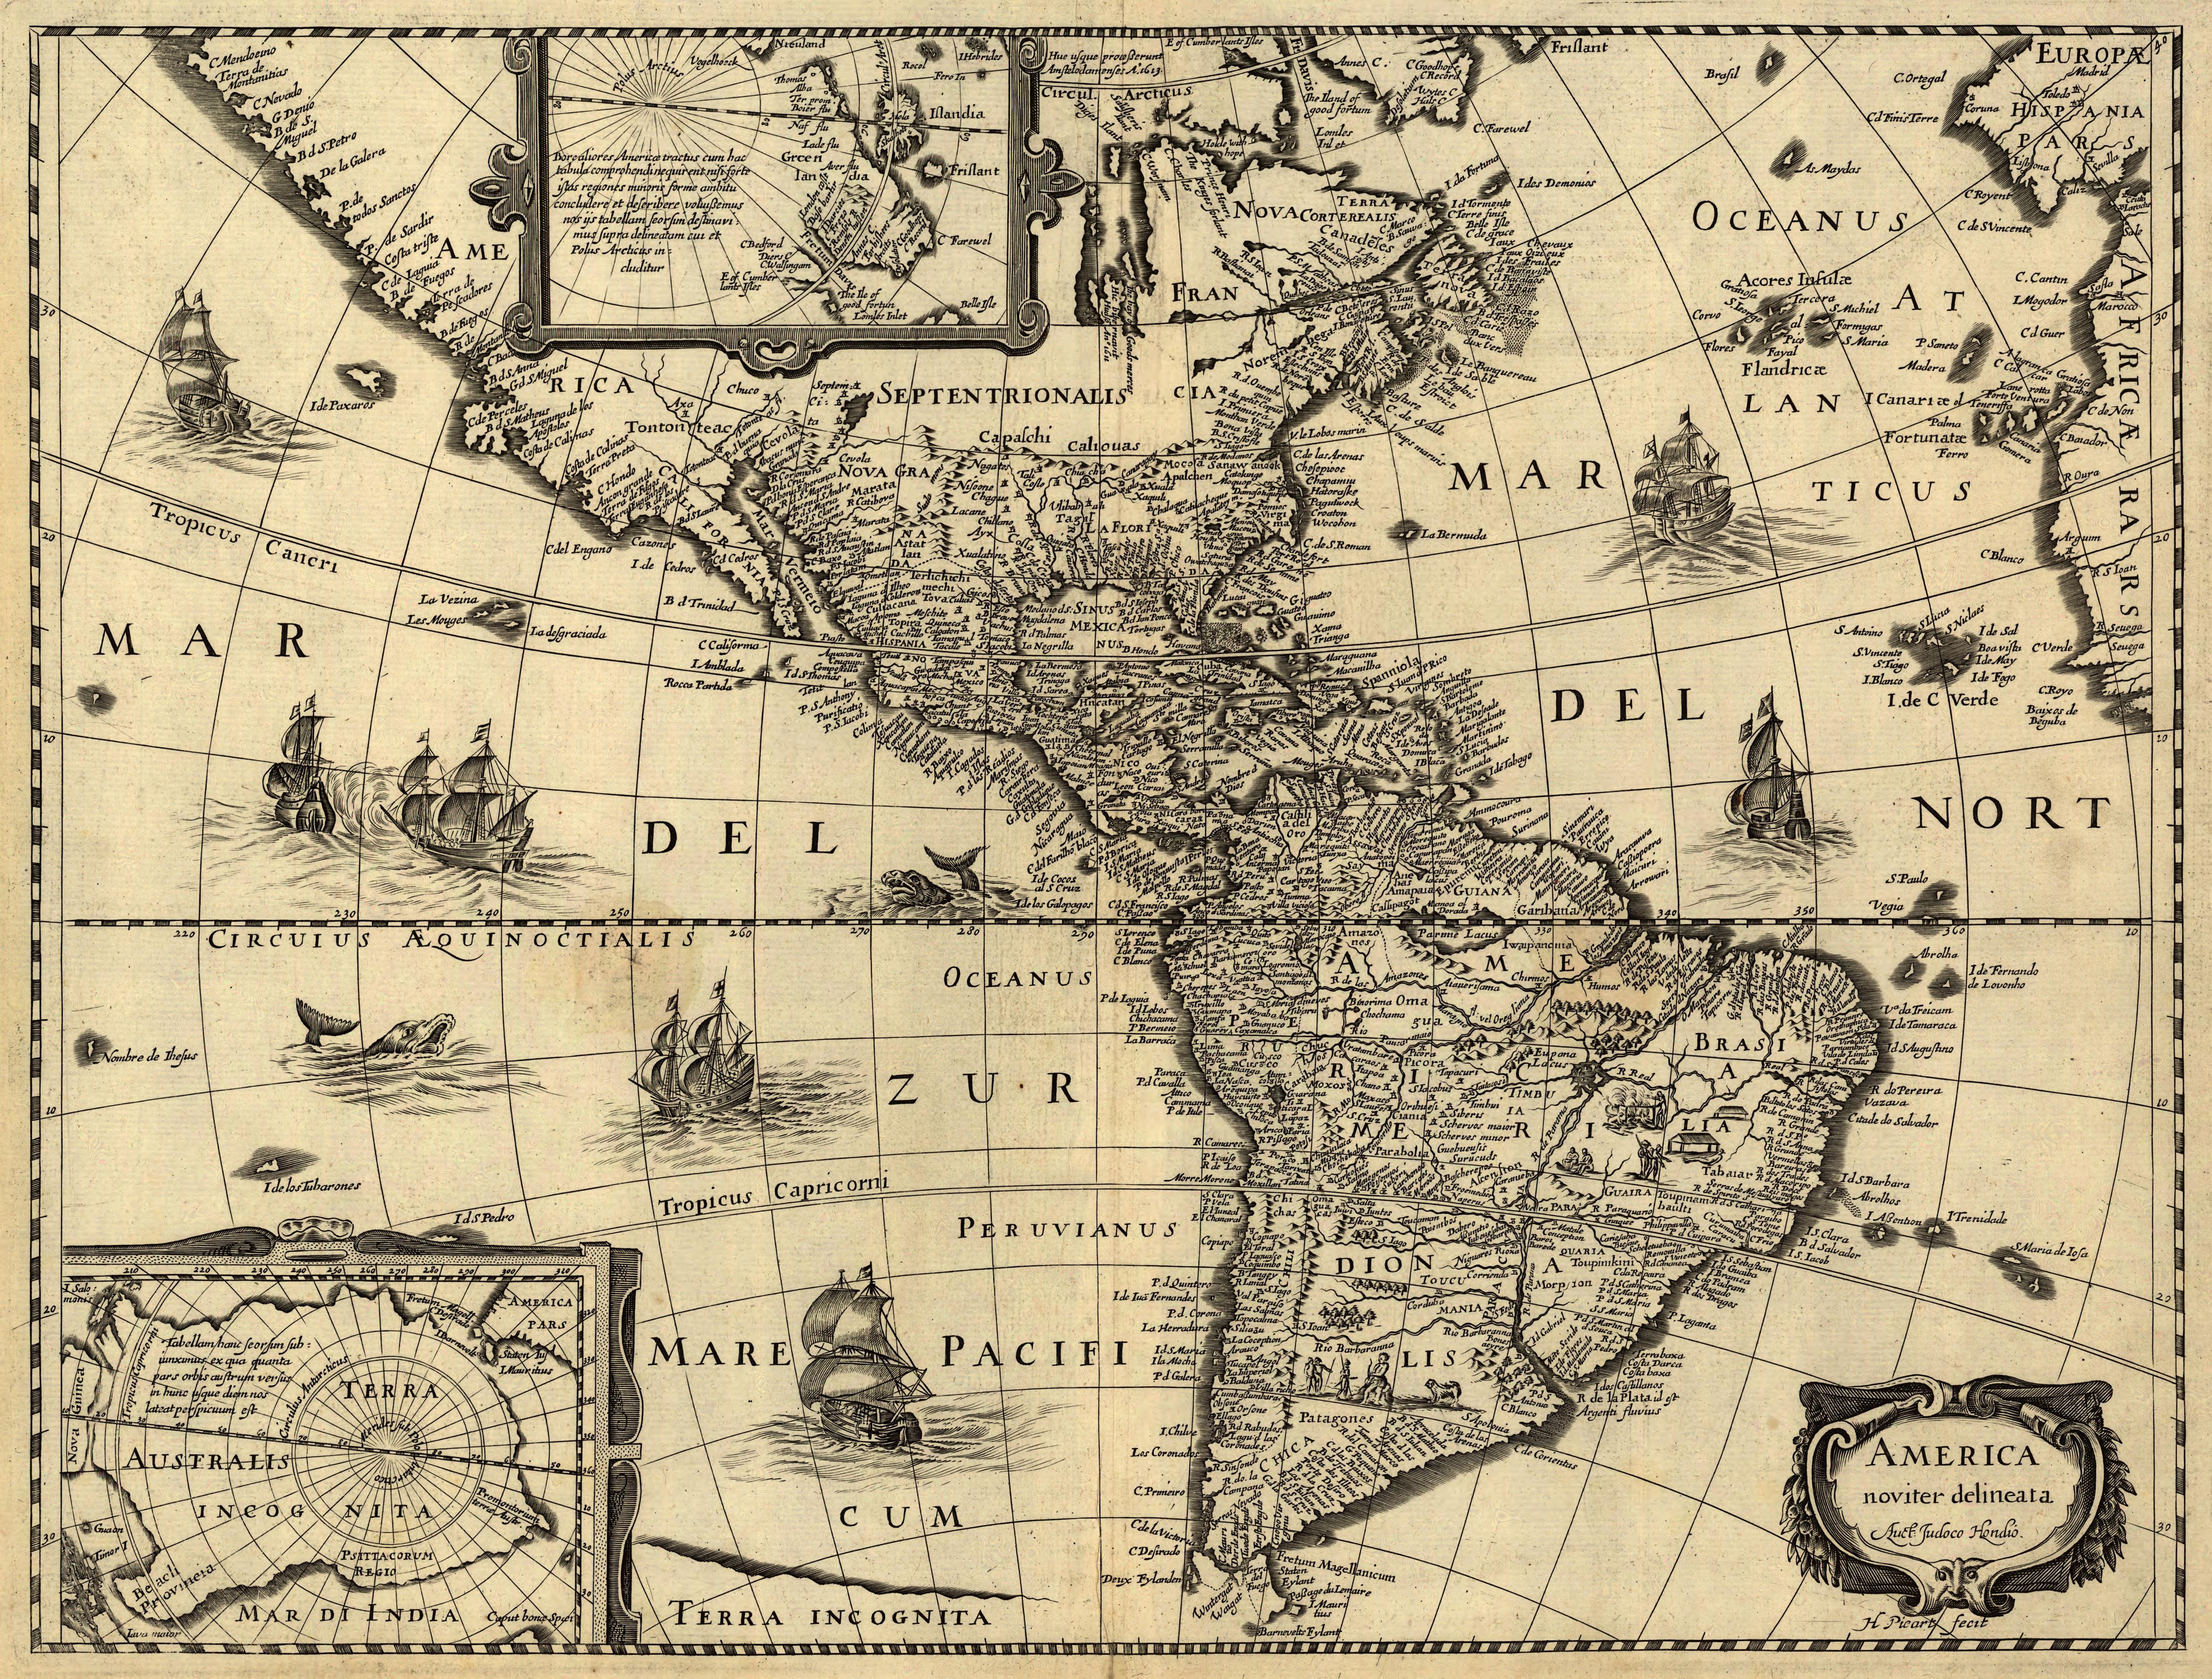 Mapa  America noviter delineata Mapa Antiguo